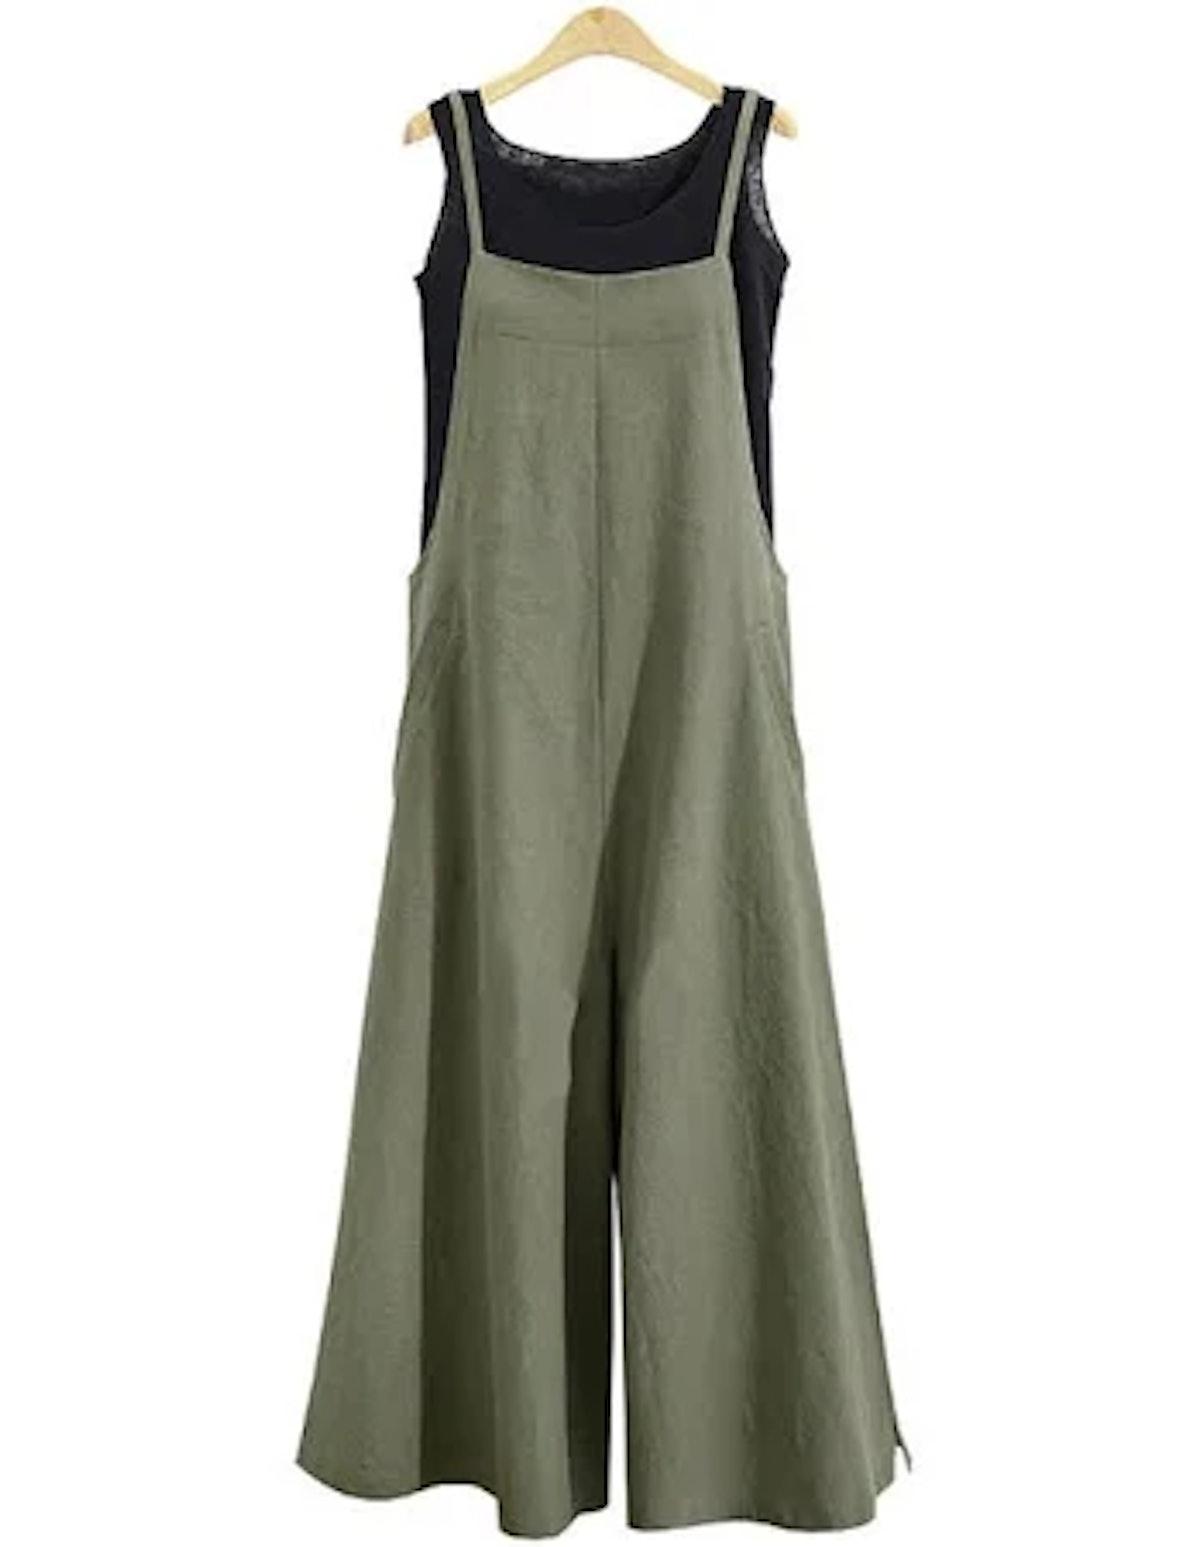 Banggood Women Overalls Bib Pants Loose Pockets Jumpsui